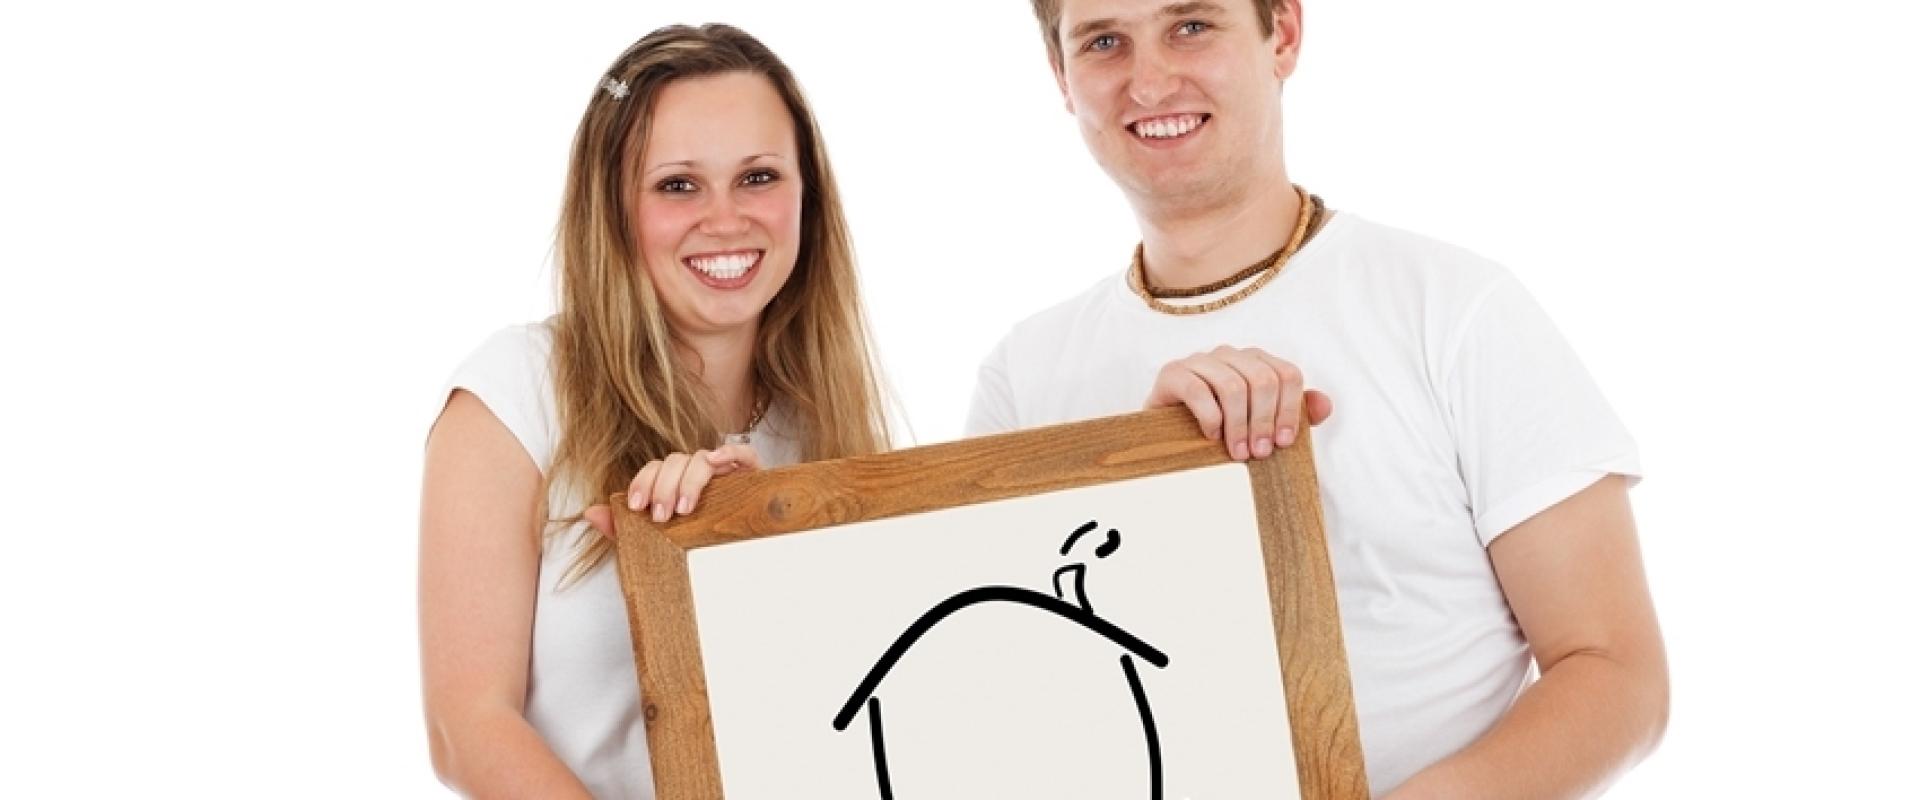 Hypotheek advies: wat komt er aan bod? [checklist]